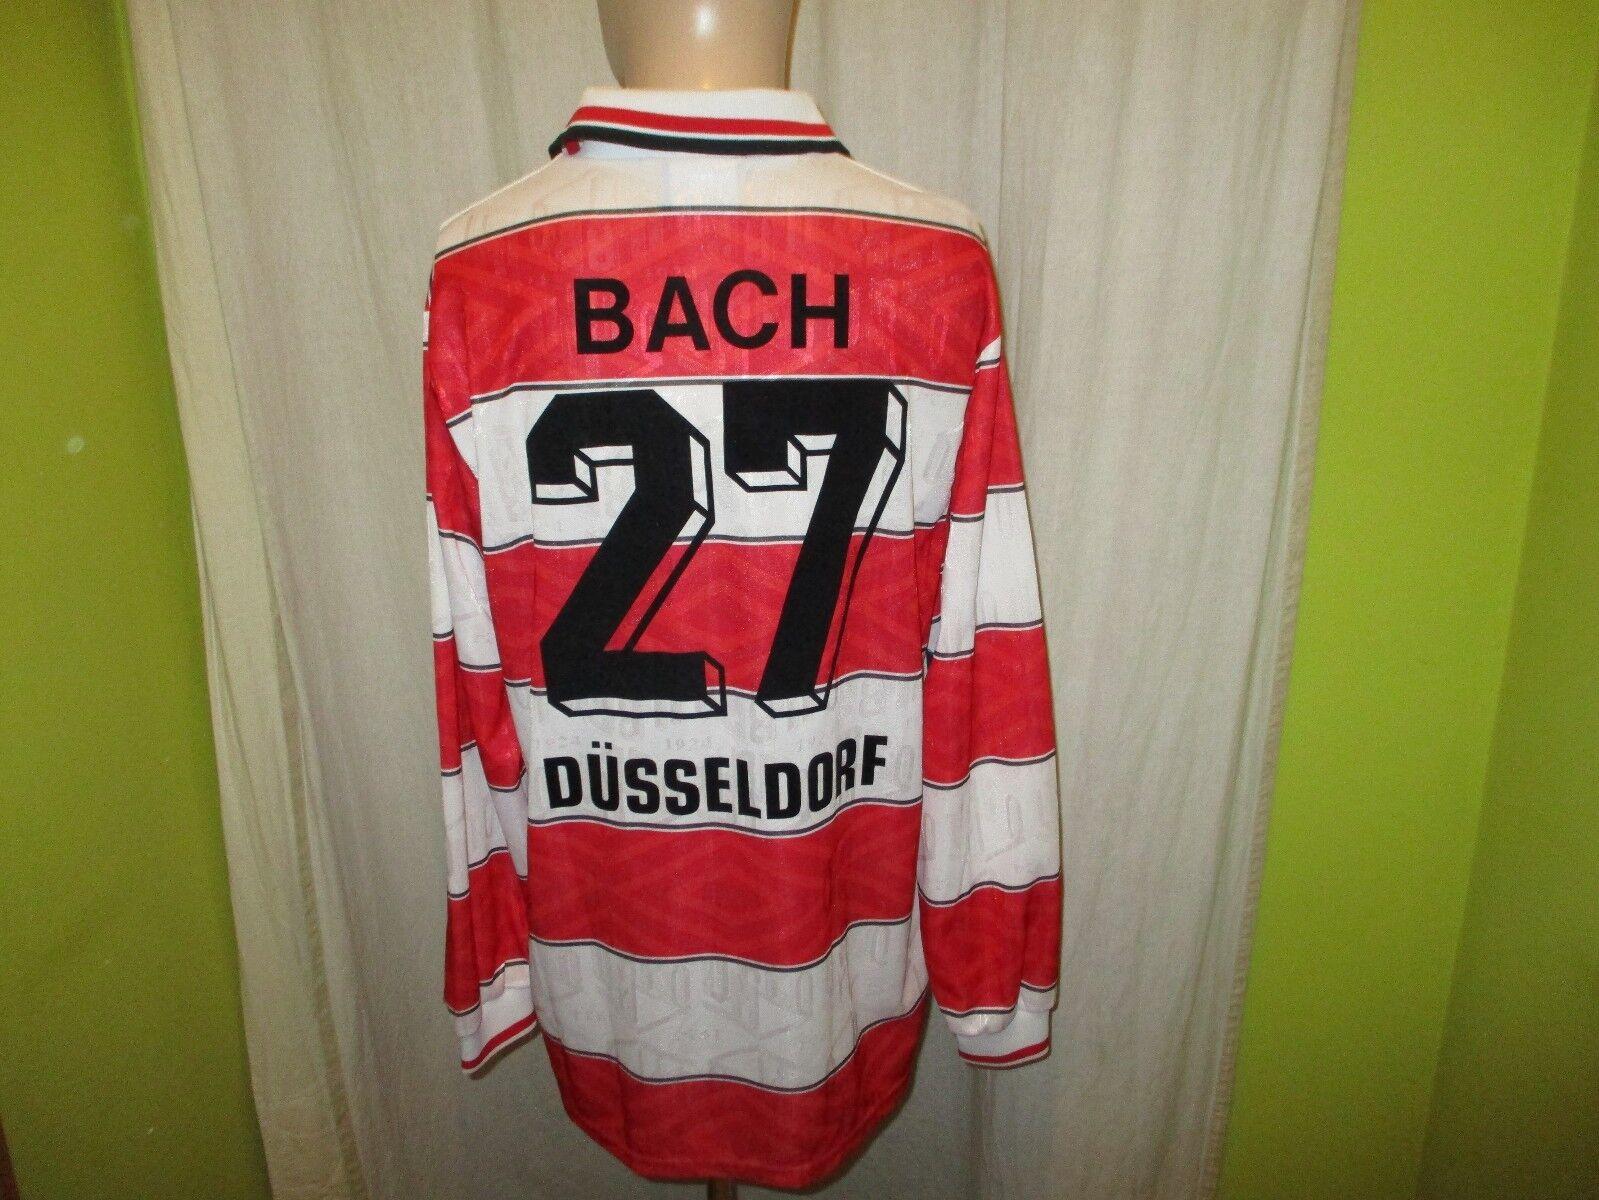 Fortuna Düsseldorf umbro Langarm Matchworn Trikot 1995 96 96 96 + Nr.27 Bach Gr.XL  | Neues Produkt  06749f